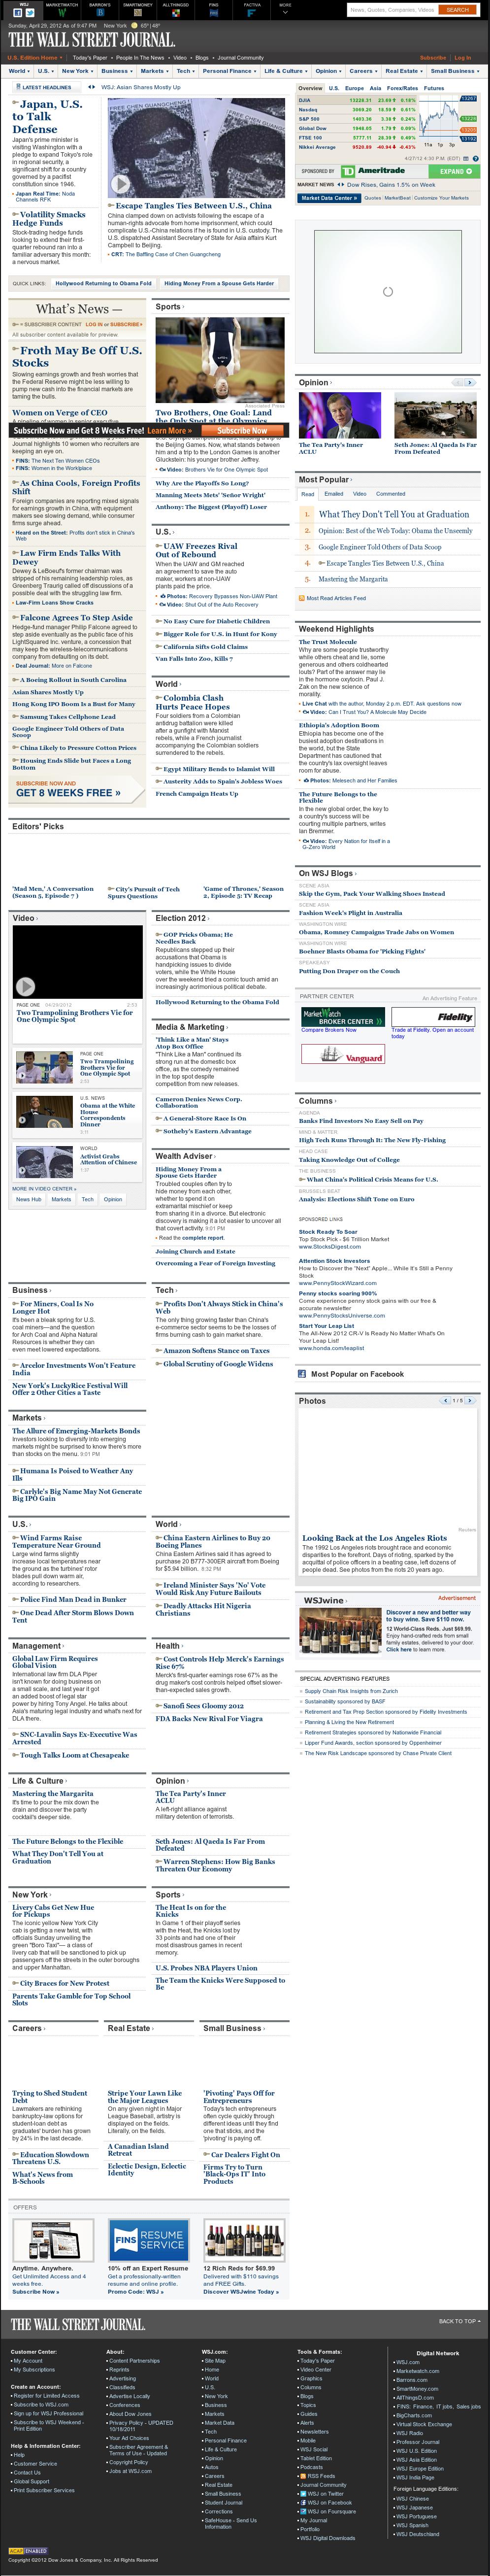 The Wall Street Journal at Monday April 30, 2012, 5:12 a.m. UTC